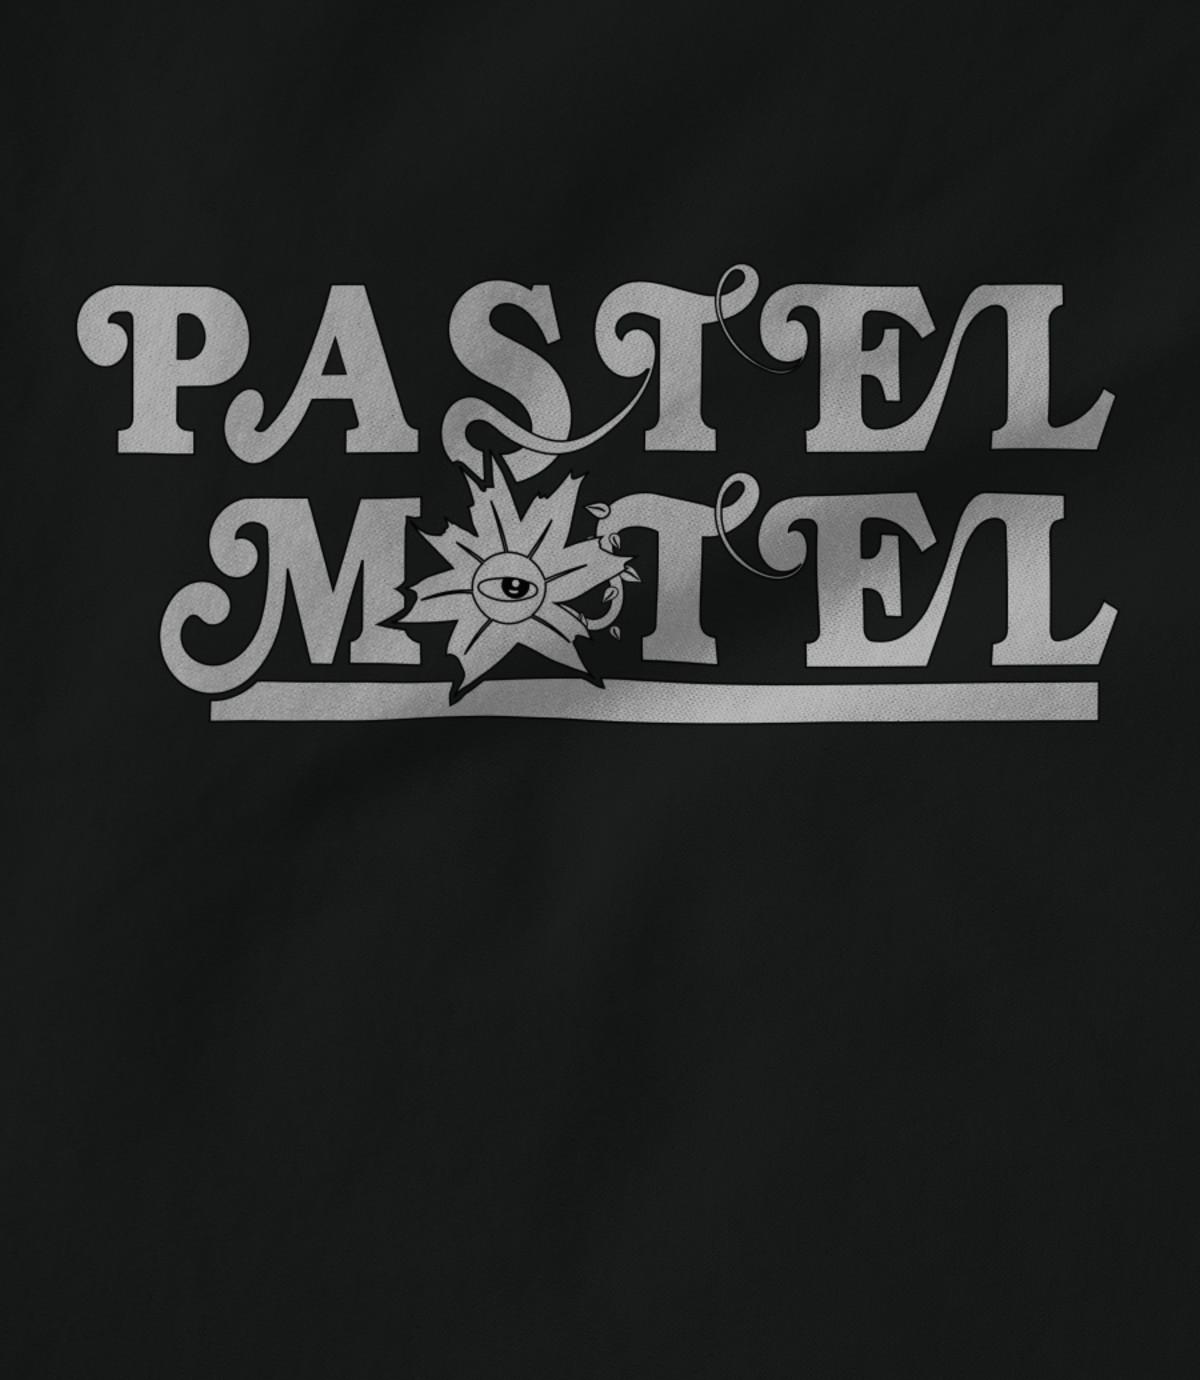 Pastel motel 70s vibes 1513272022